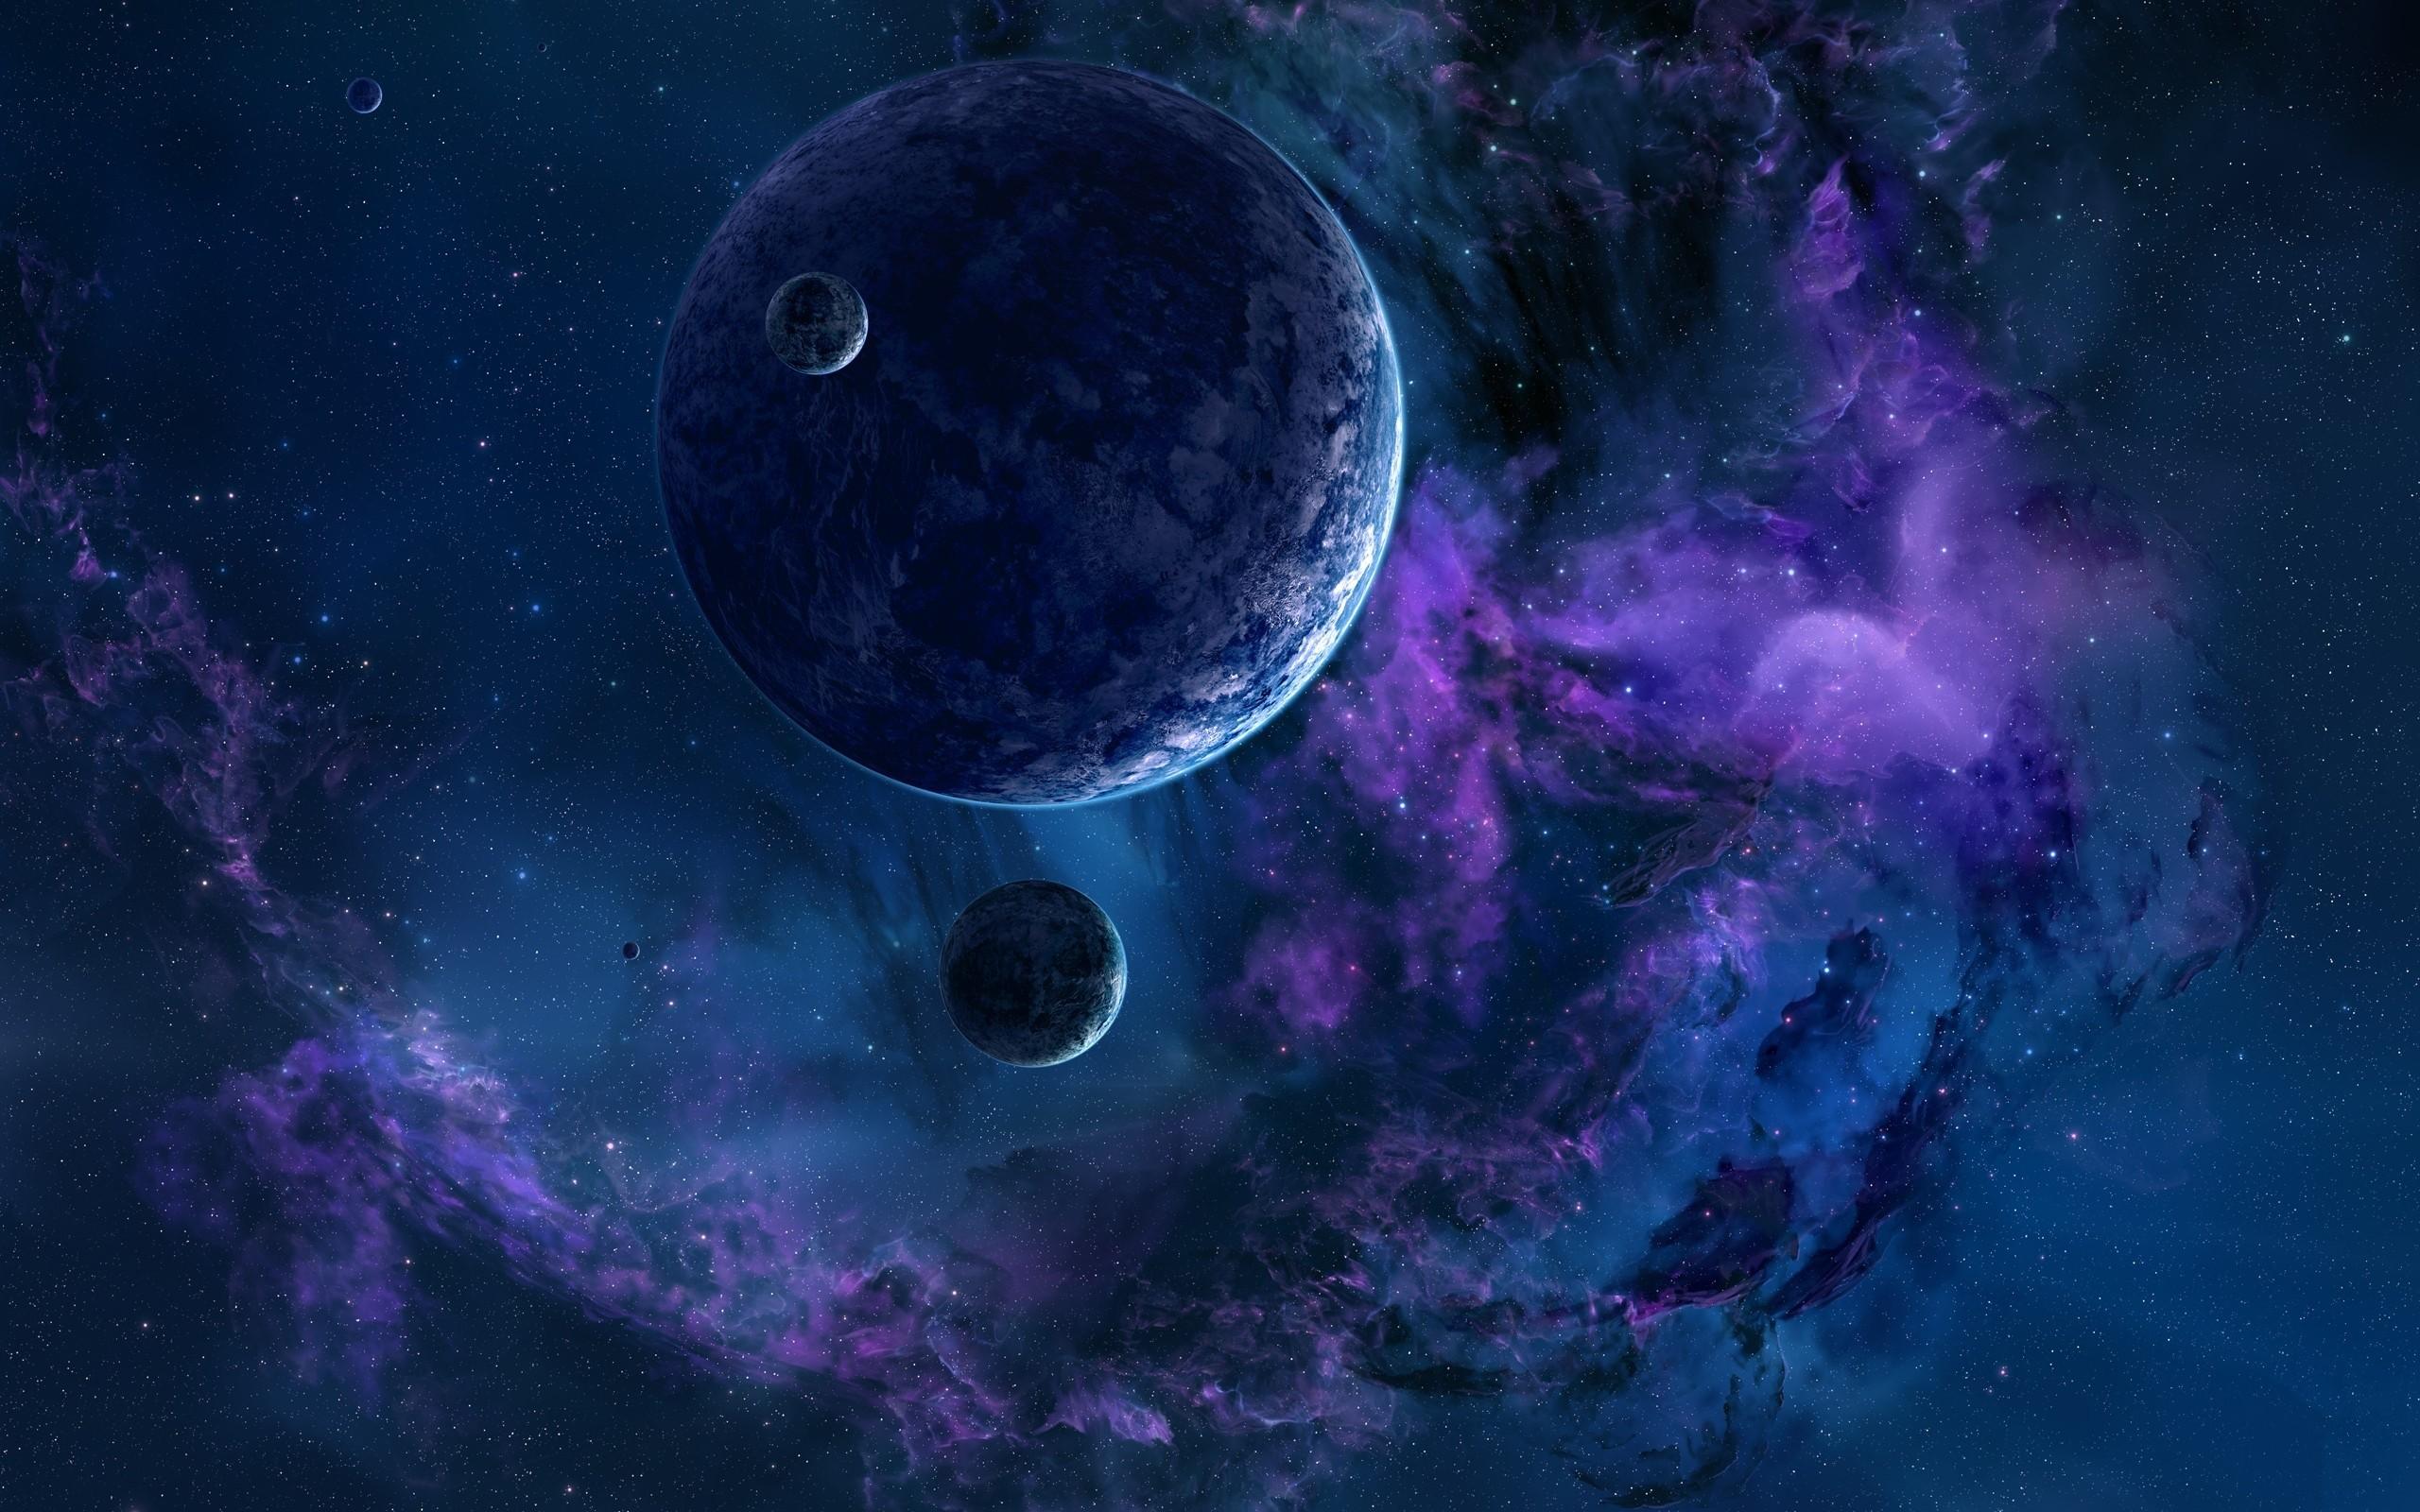 Space 3d art planet stars nebula g wallpaper     147083 .